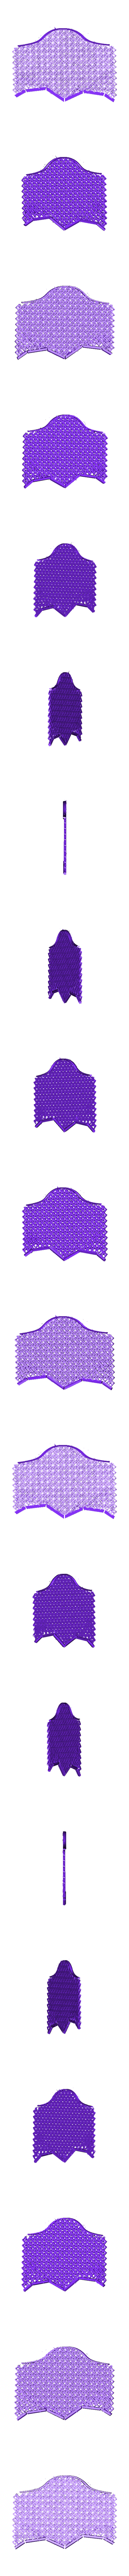 "Mask.stl Download free STL file 3D ""Fabric"" Surgical Mask • 3D printable design, Lockheart"